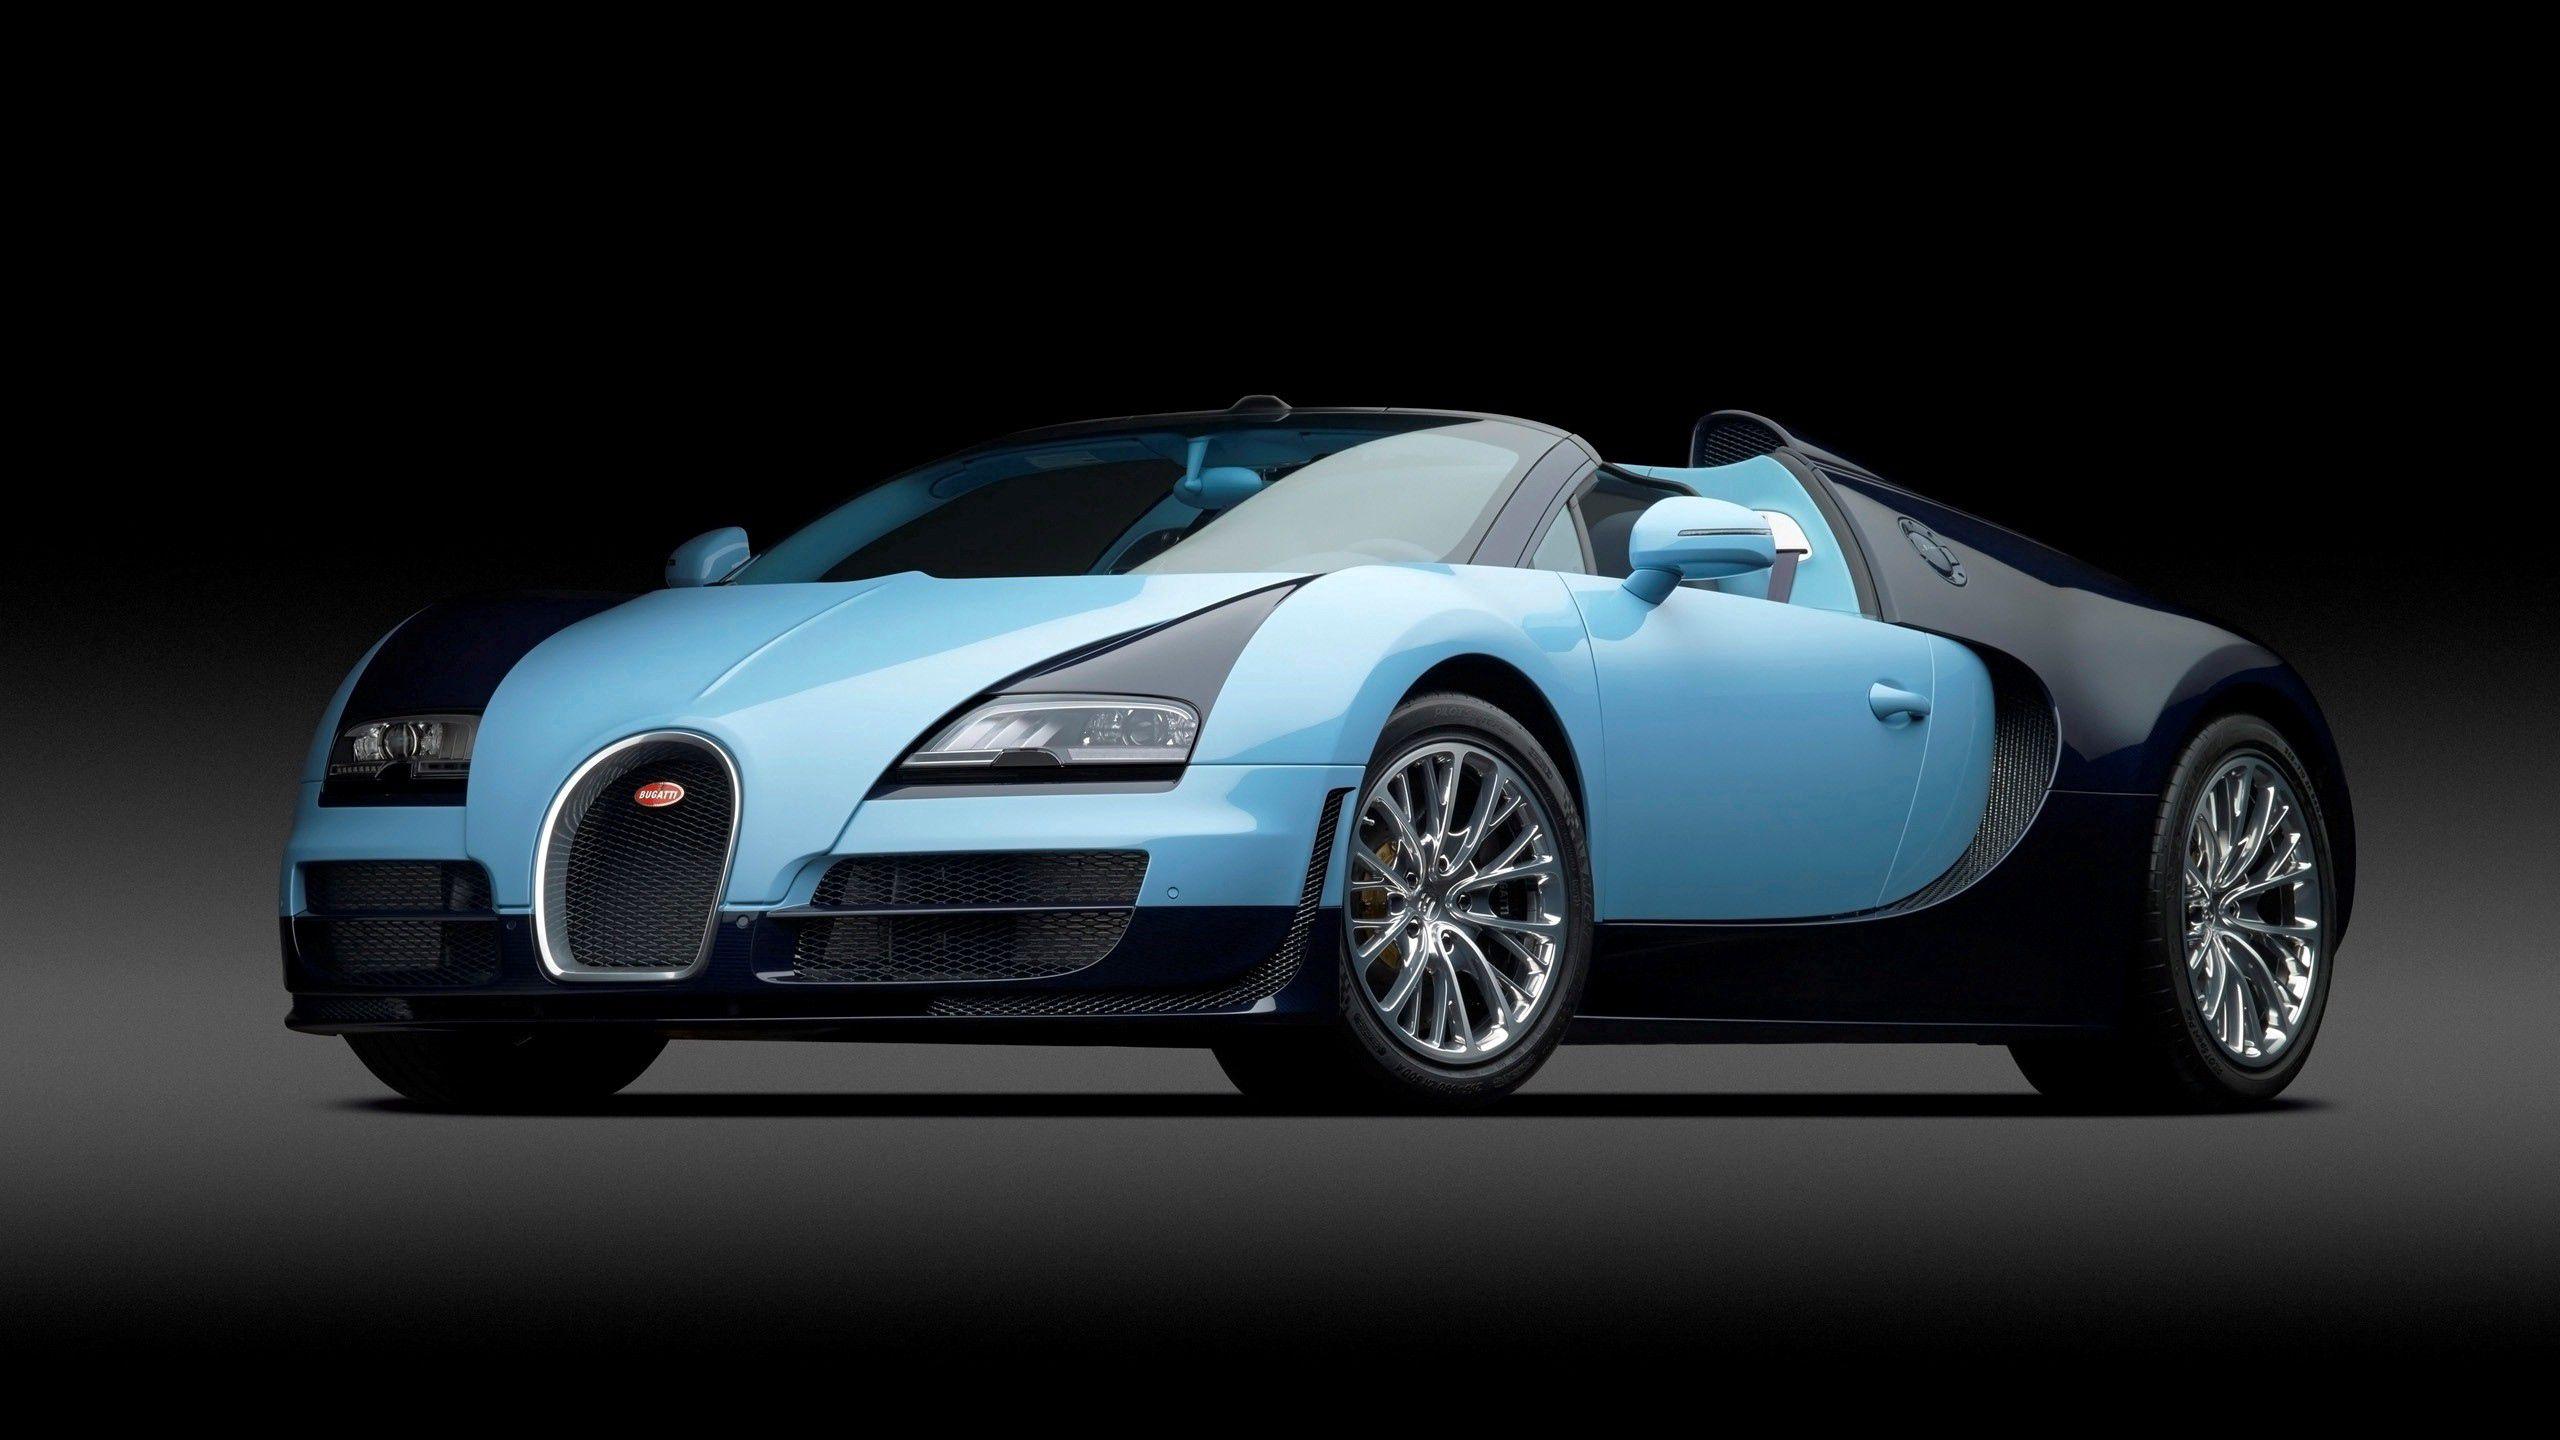 118208 скачать обои Тачки (Cars), Автомобиль, Bugatti Veyron, Bugatti Veyron Vitesse Jean-Pierre Wimille, Veyron Grand Sport Vitesse - заставки и картинки бесплатно